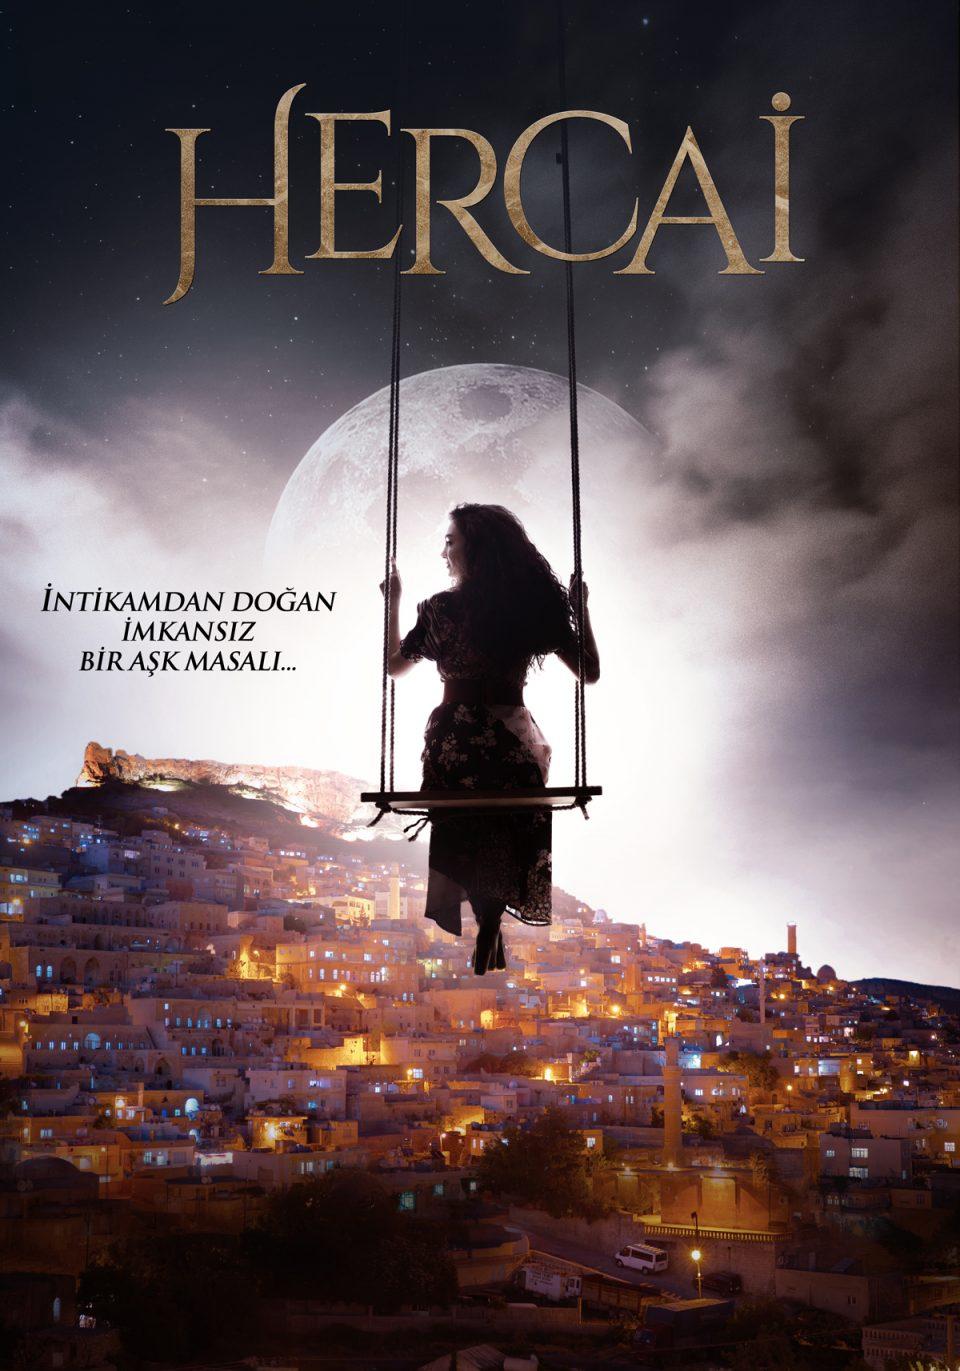 hercai-teaser